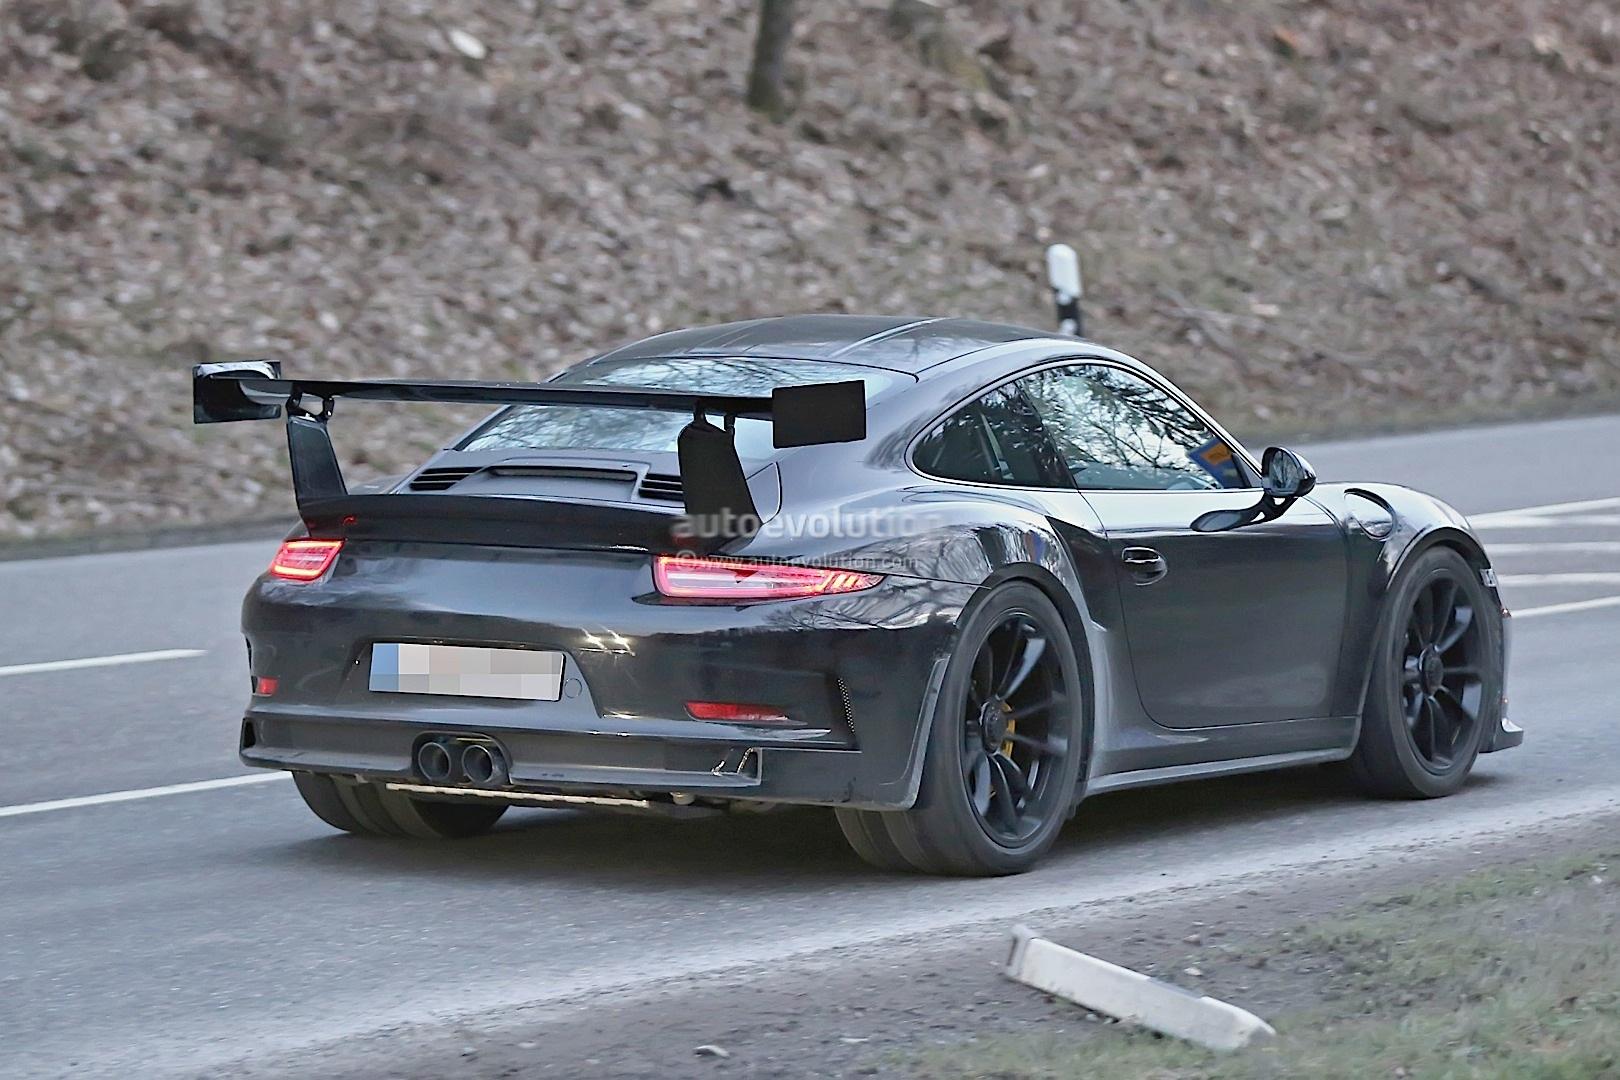 porsche spied testing new 911 gt2 autoevolution. Black Bedroom Furniture Sets. Home Design Ideas